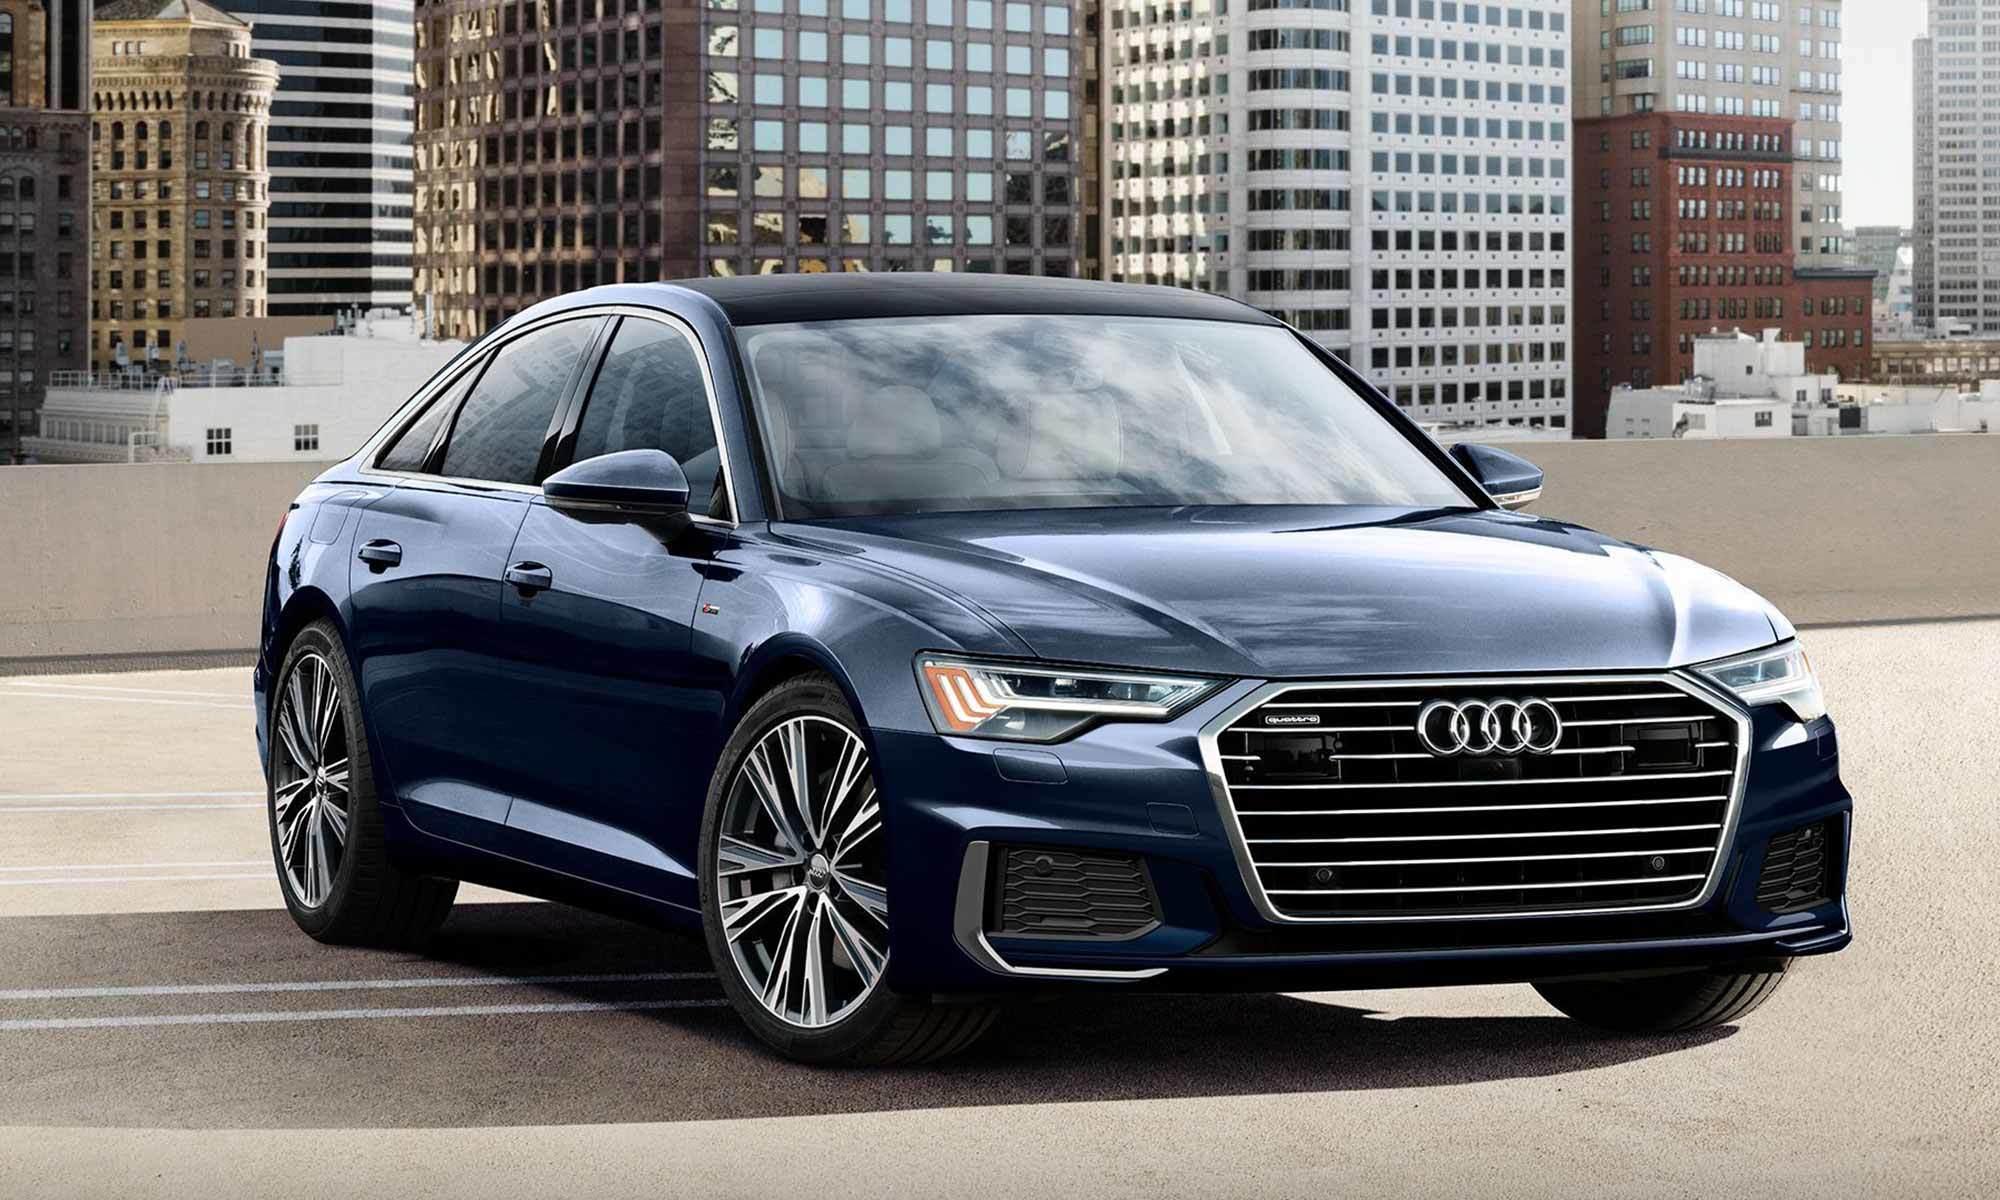 Audi A6 Tfsie Lifestyle